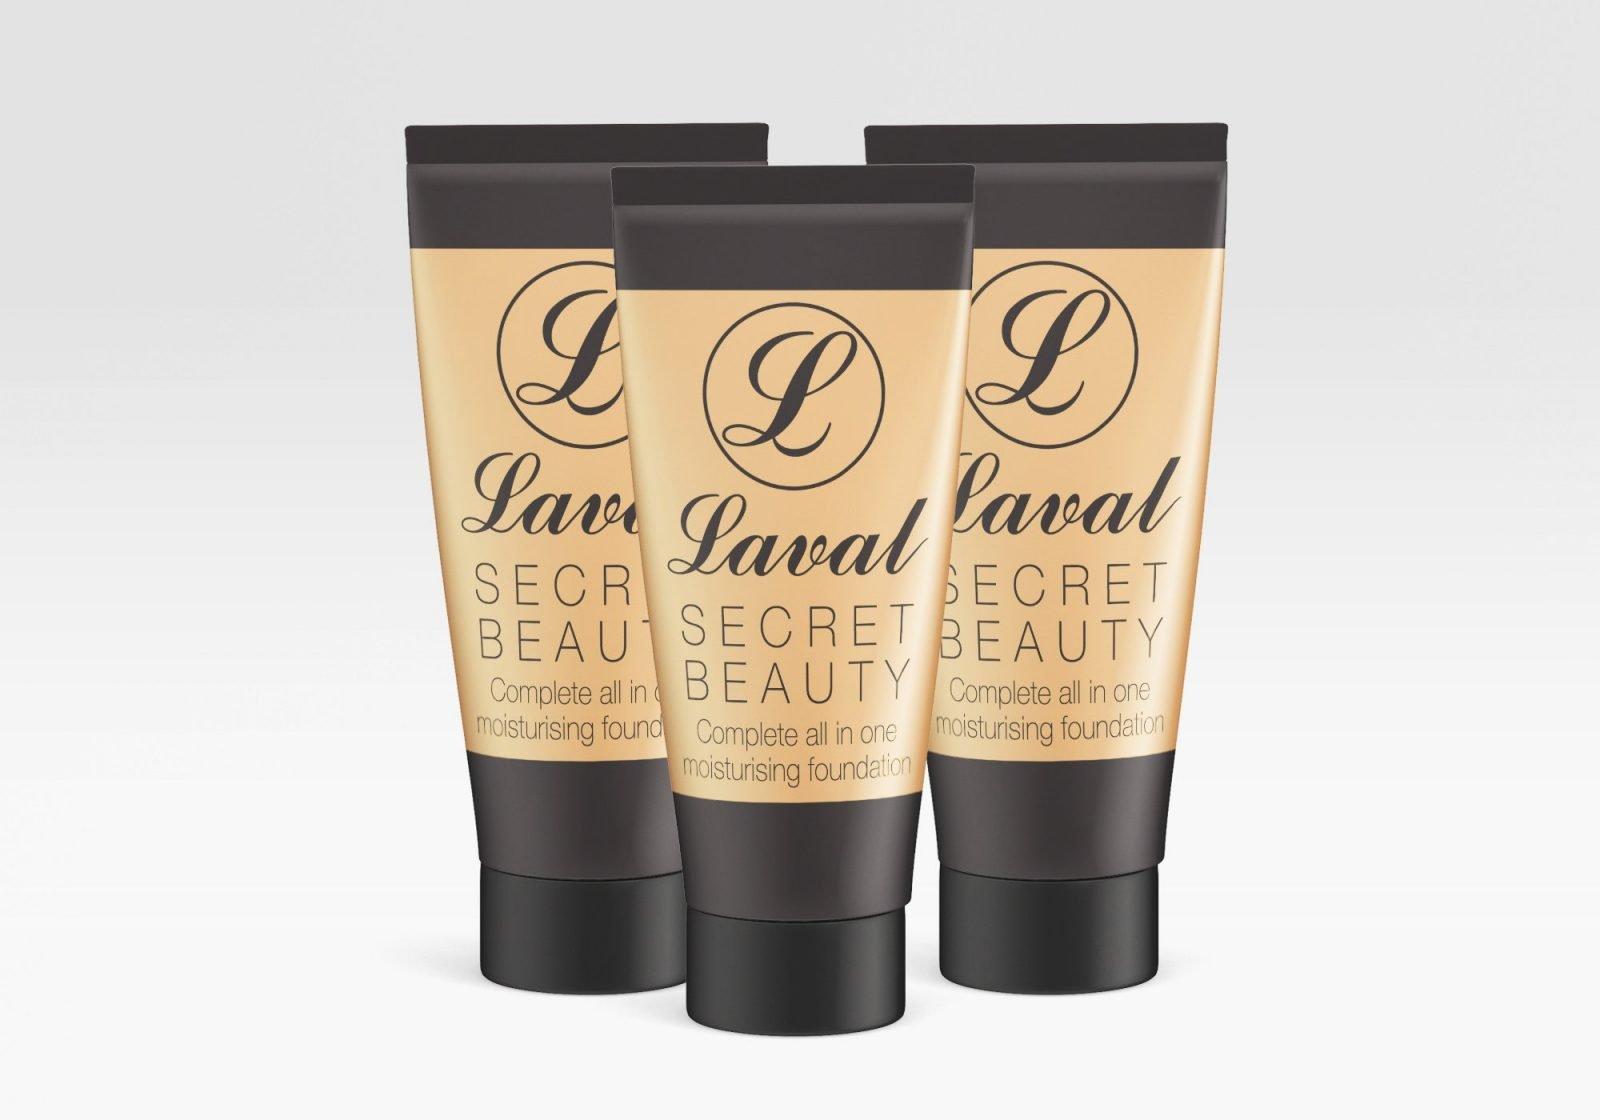 Packaging design for Laval moisturising foundation cream showing three bottles